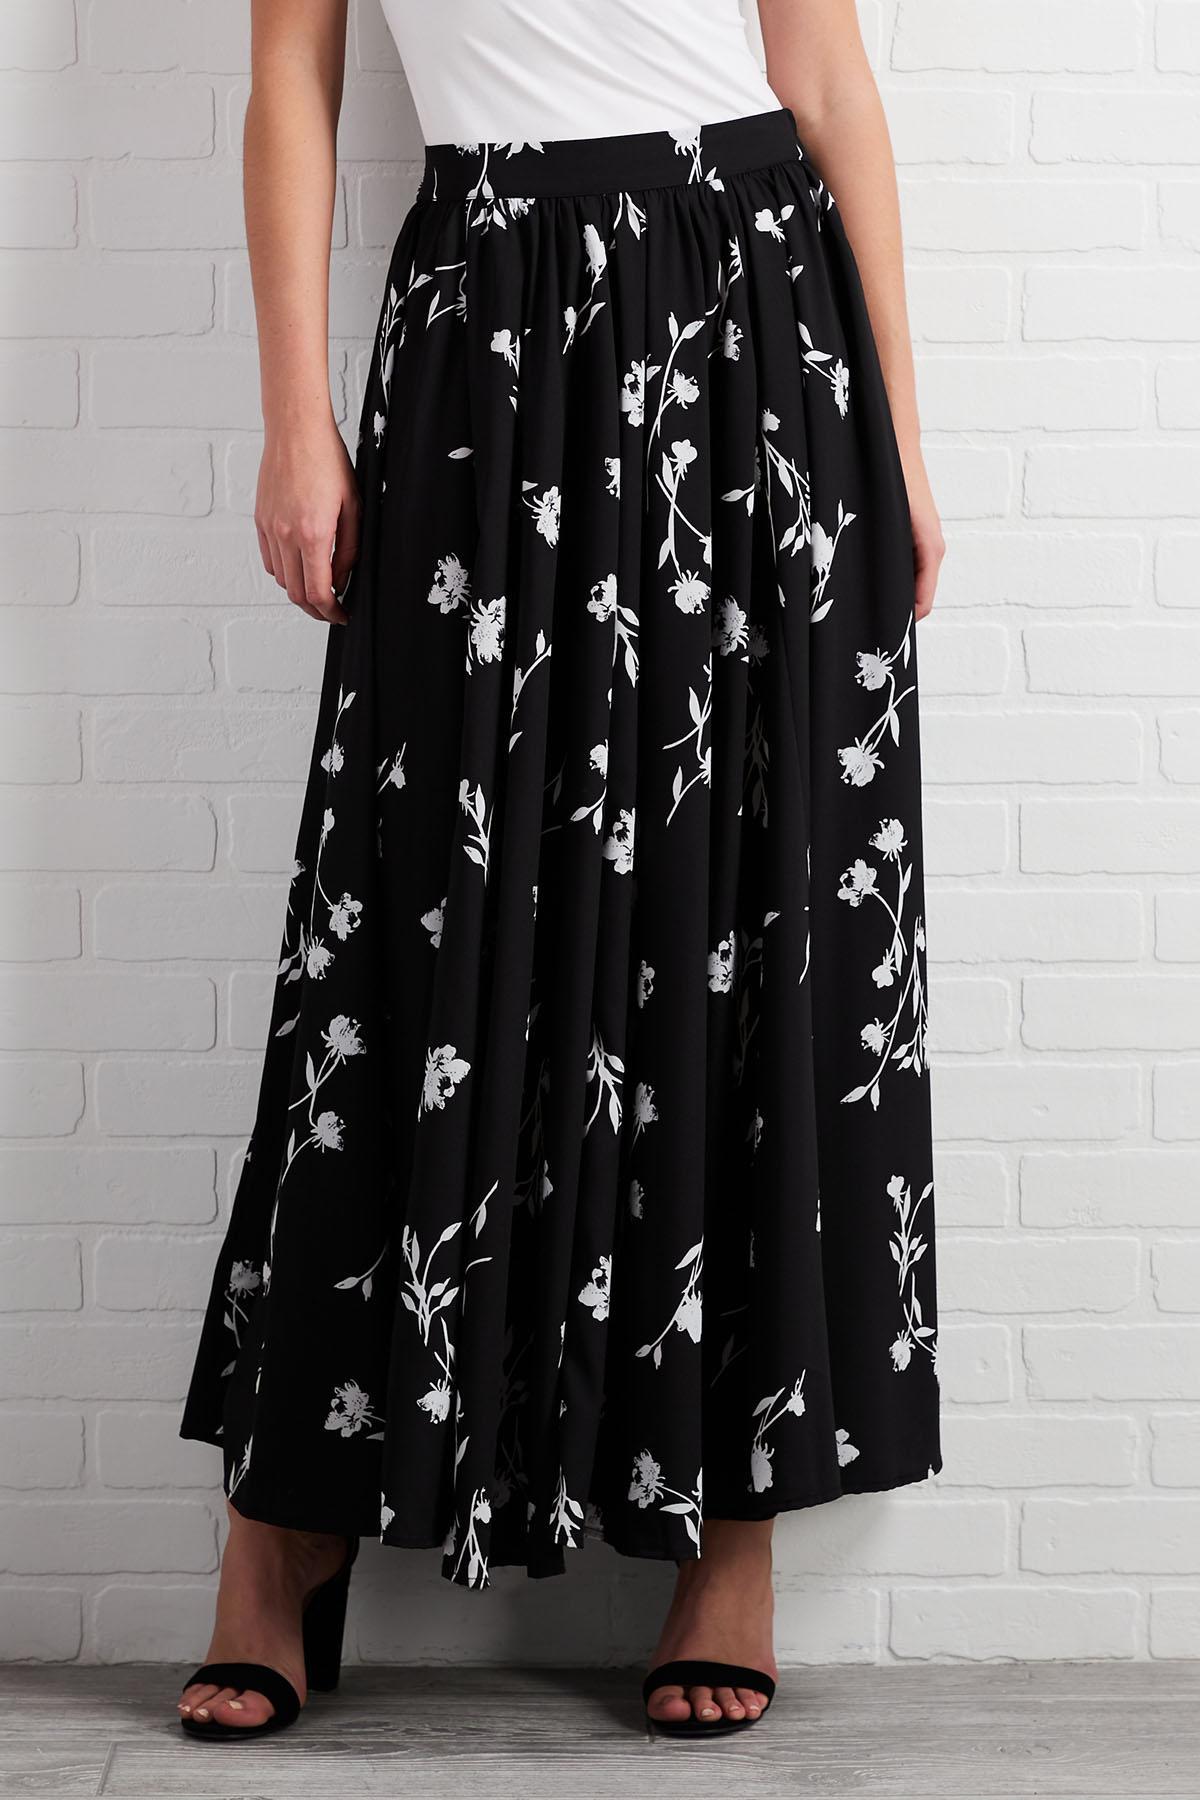 Intertwined Skirt